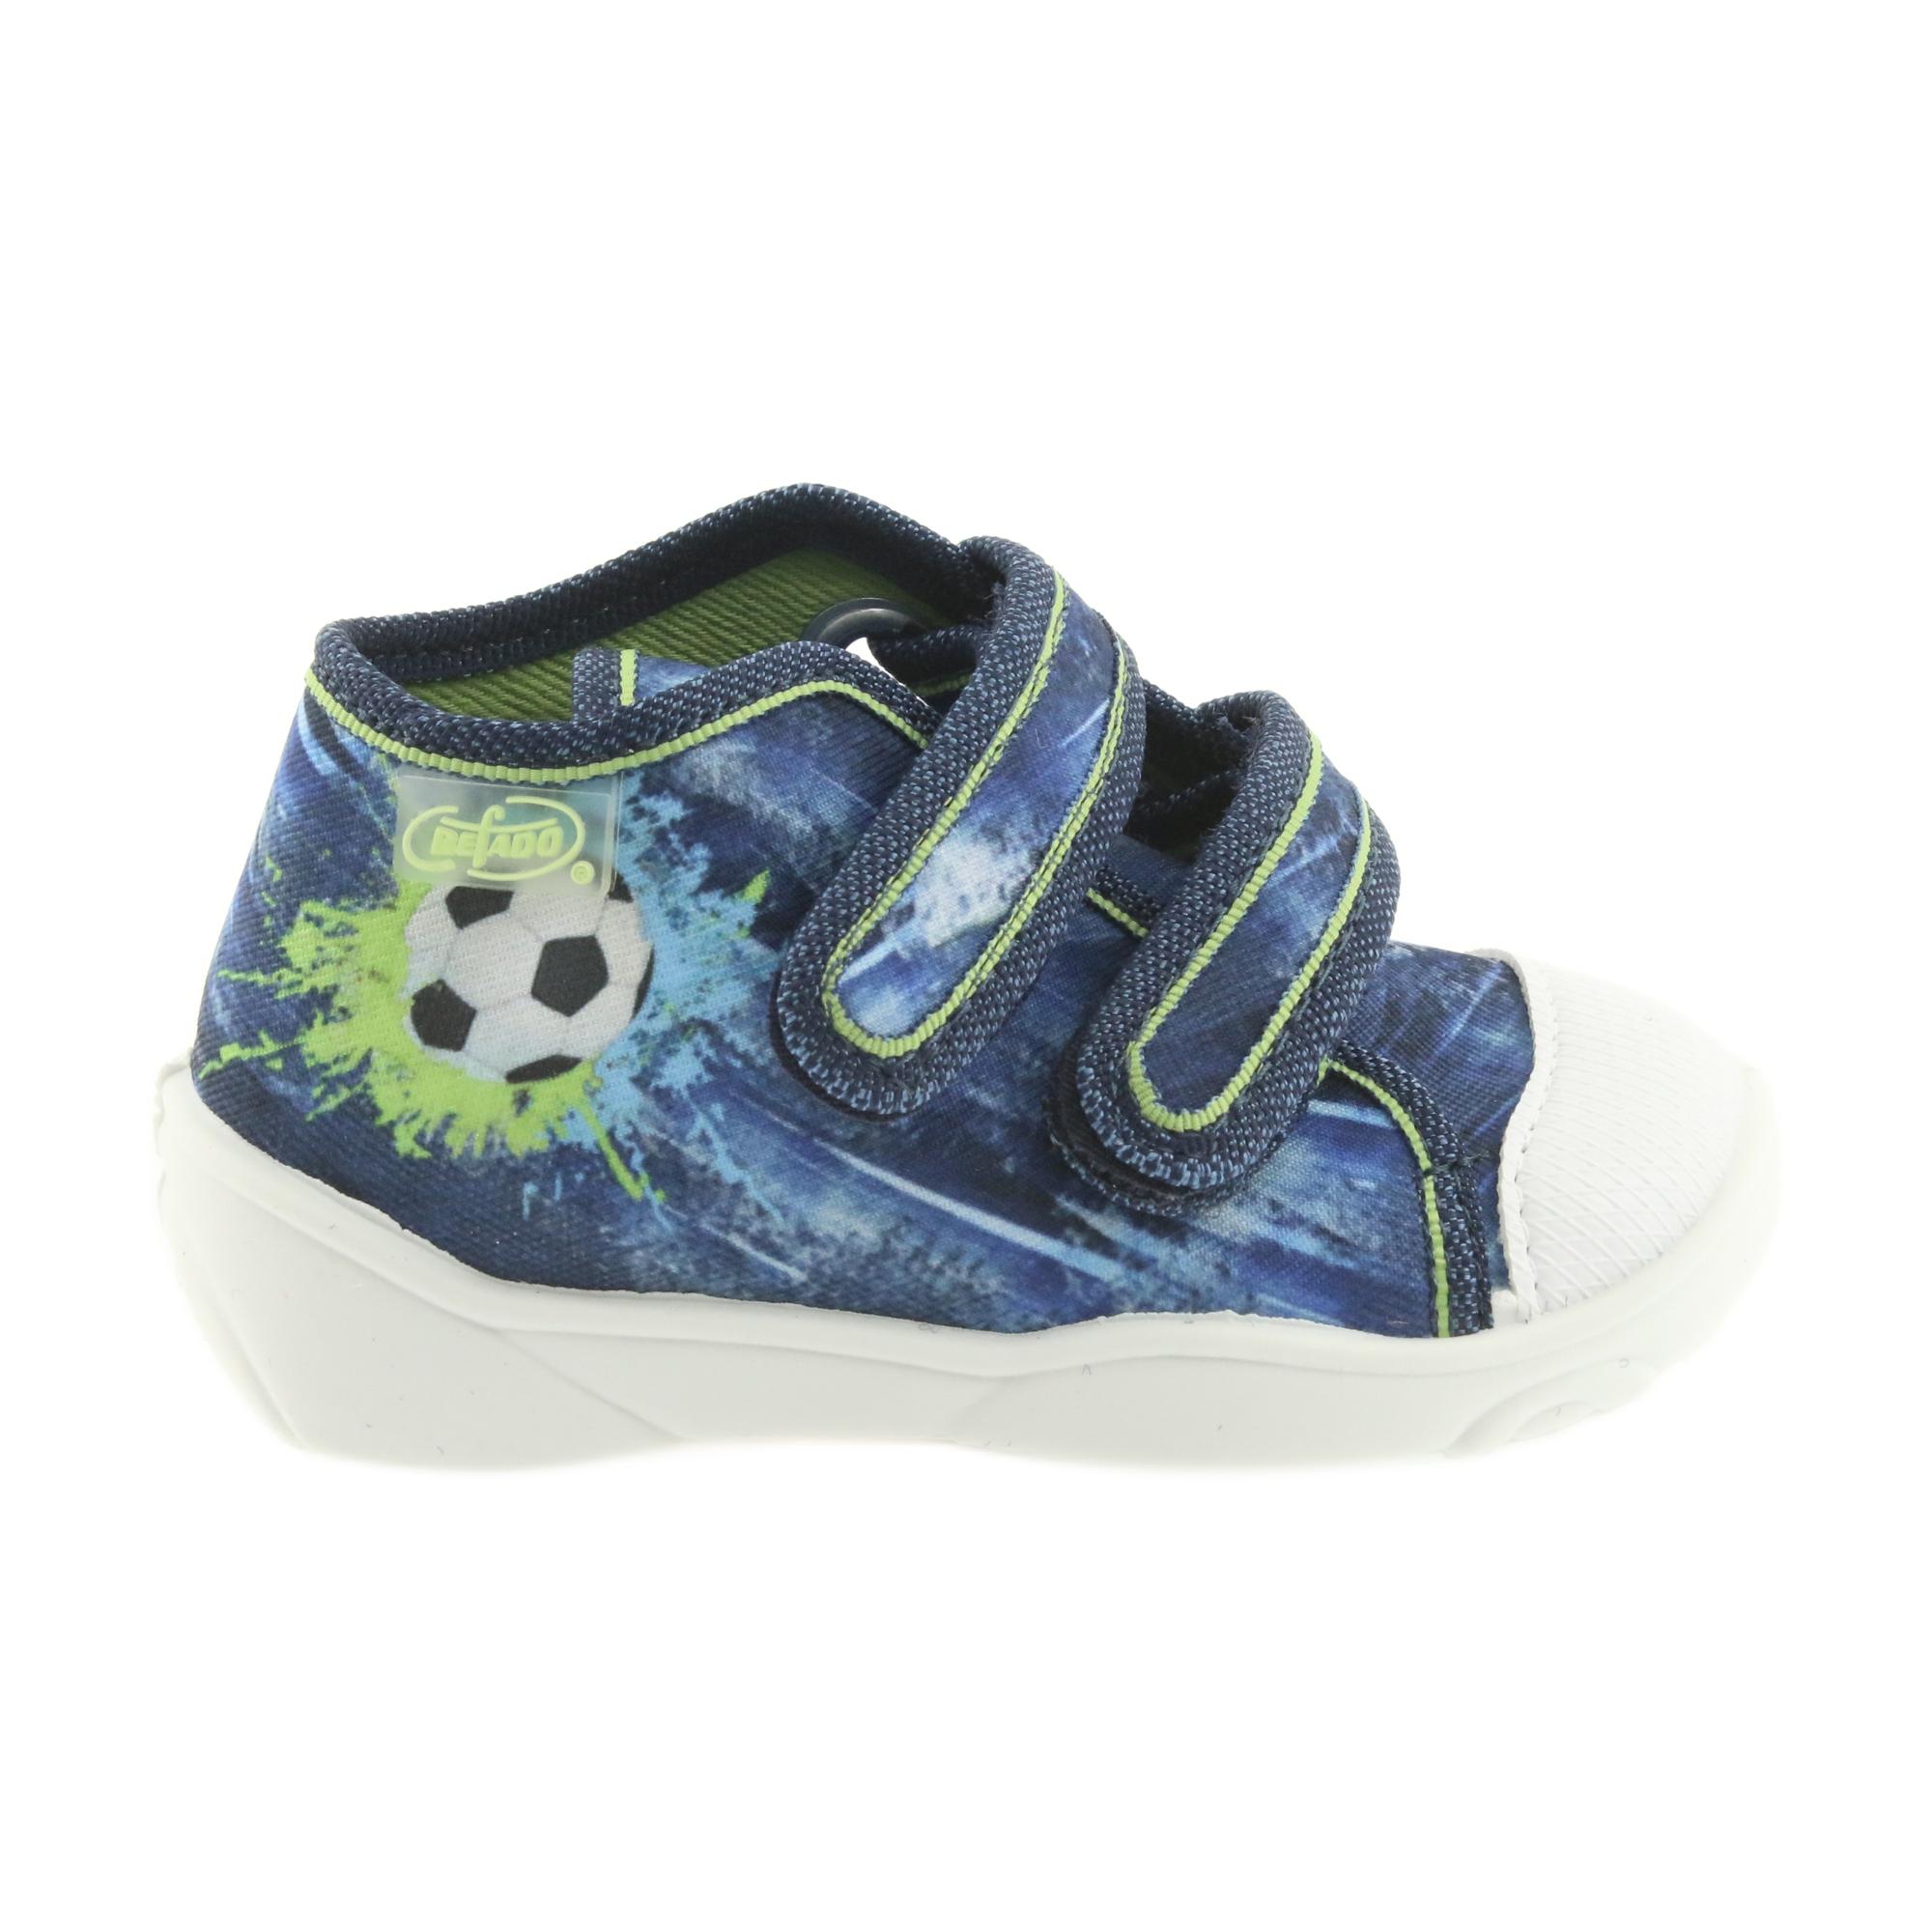 Scarpe da calcio per bambini Befado 212P058 blu verde marina